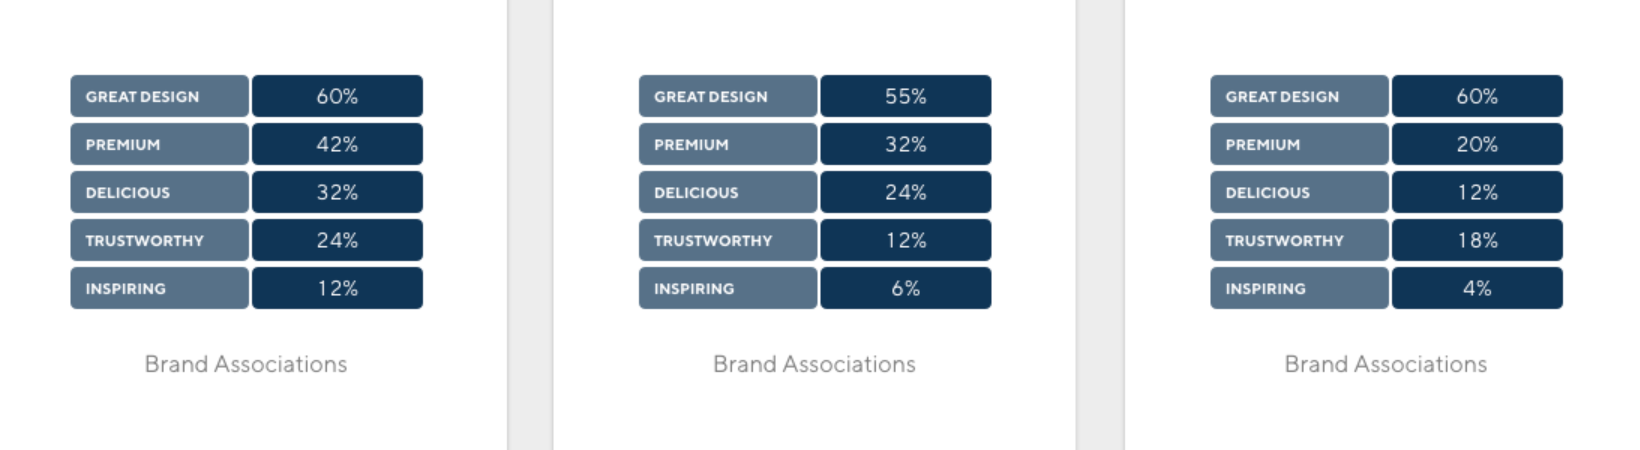 Latana Brand Analytics Brand Association